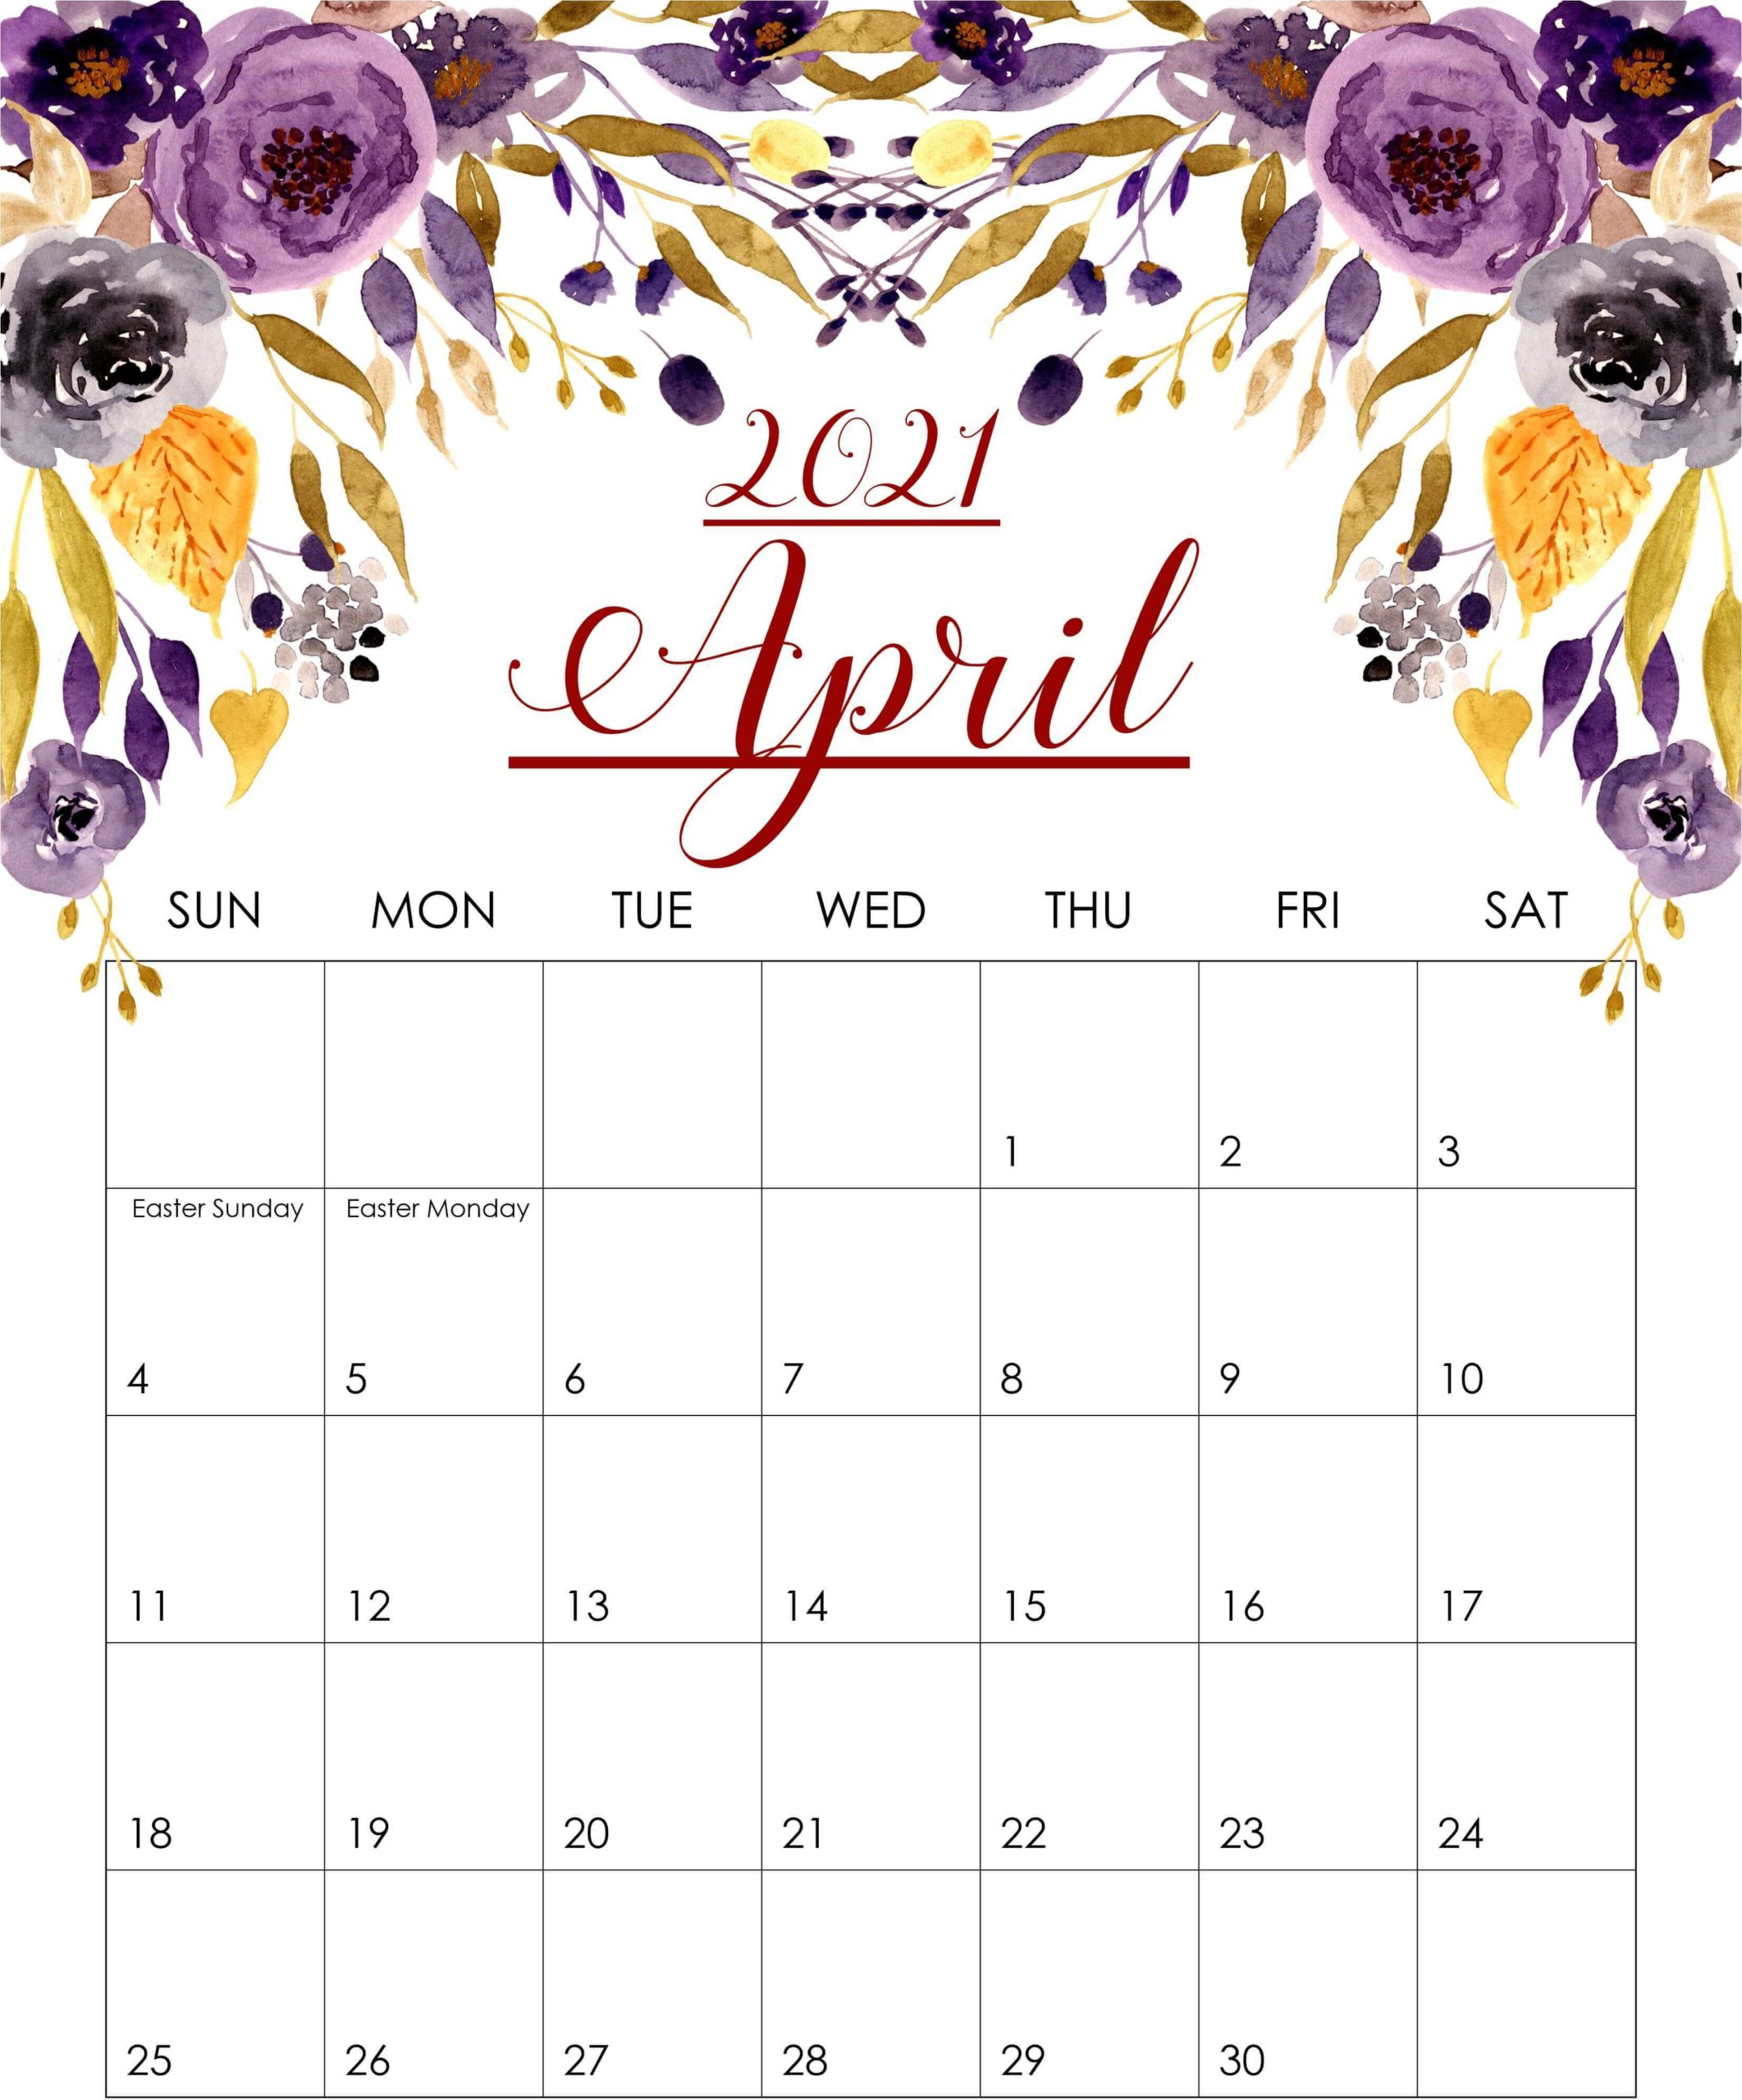 Floral April 2021 Calendar